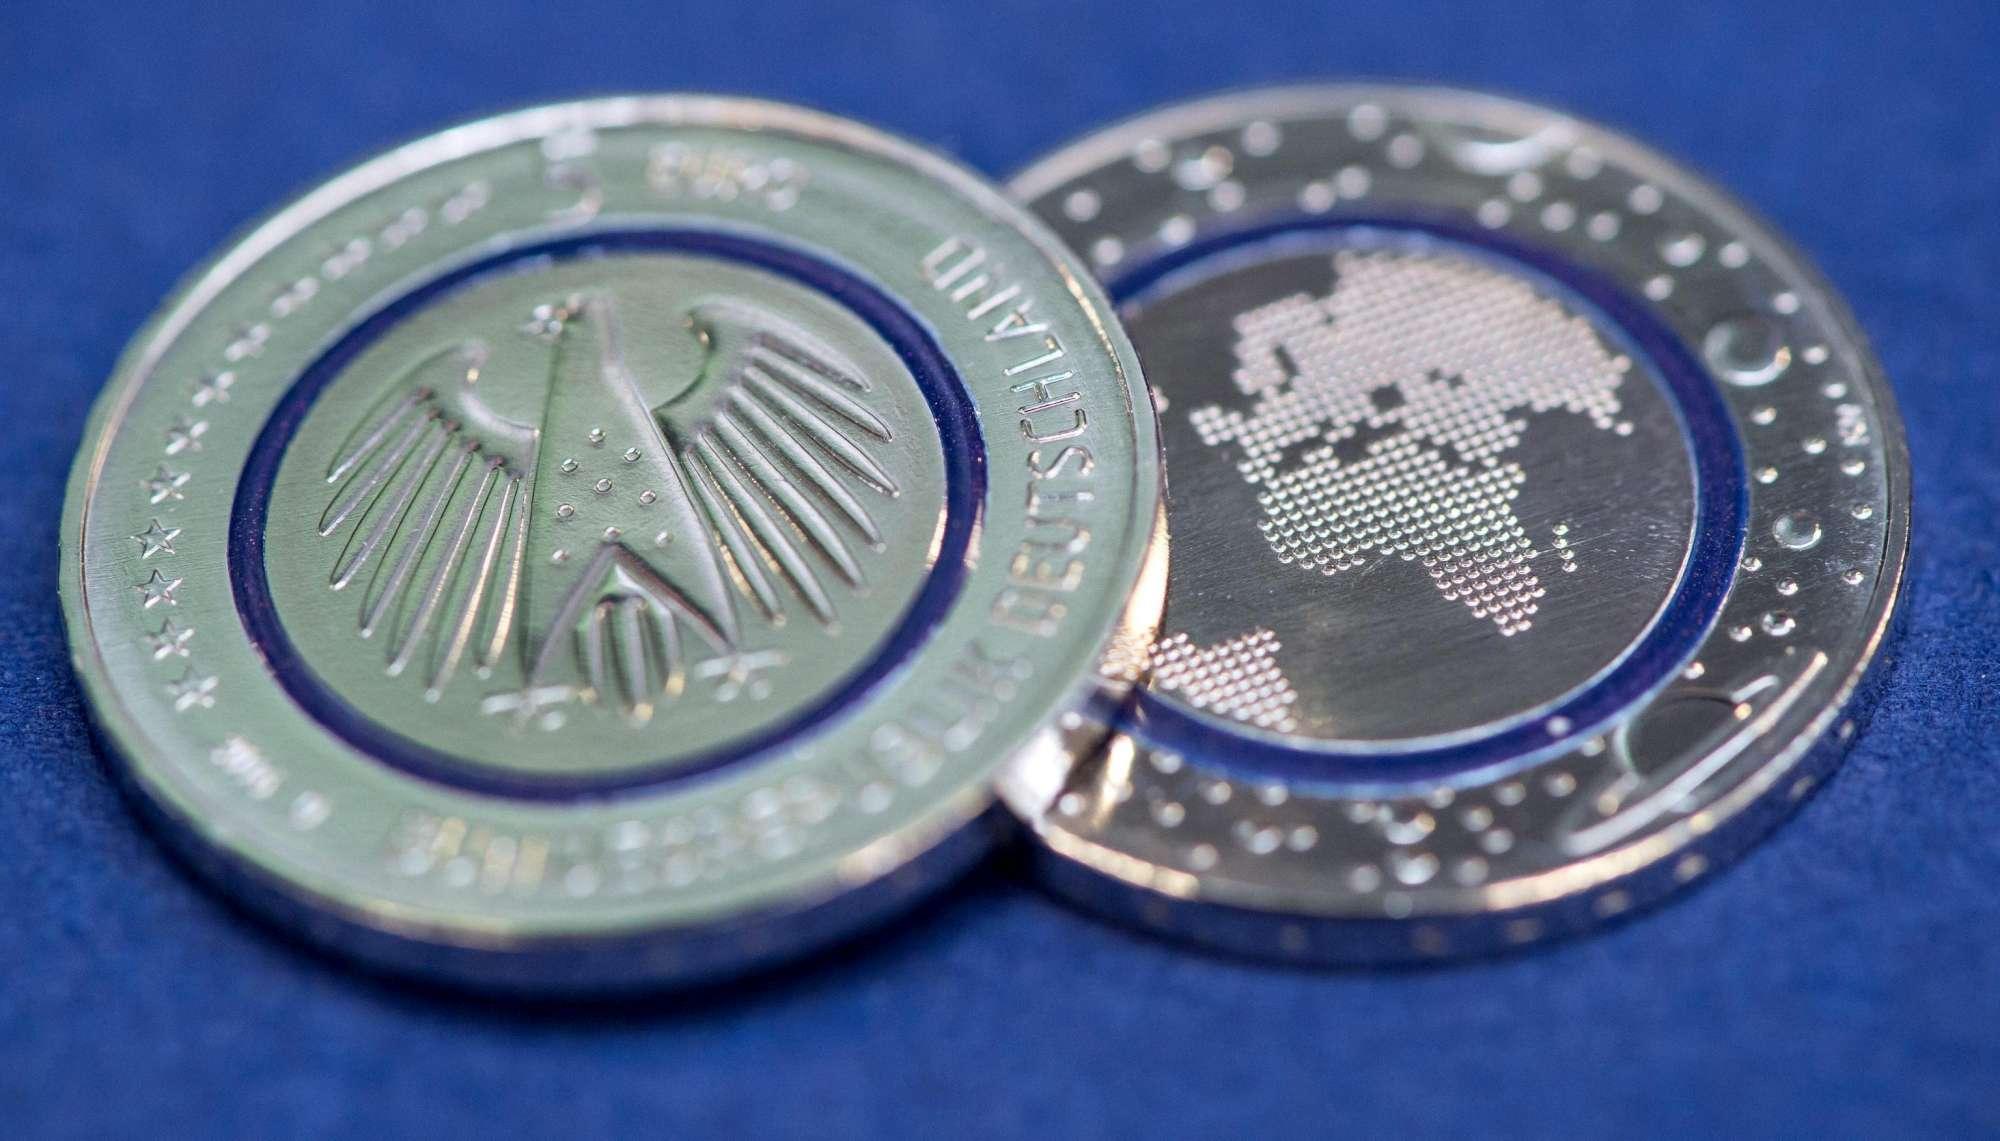 germania conia nuova moneta da 5 euro